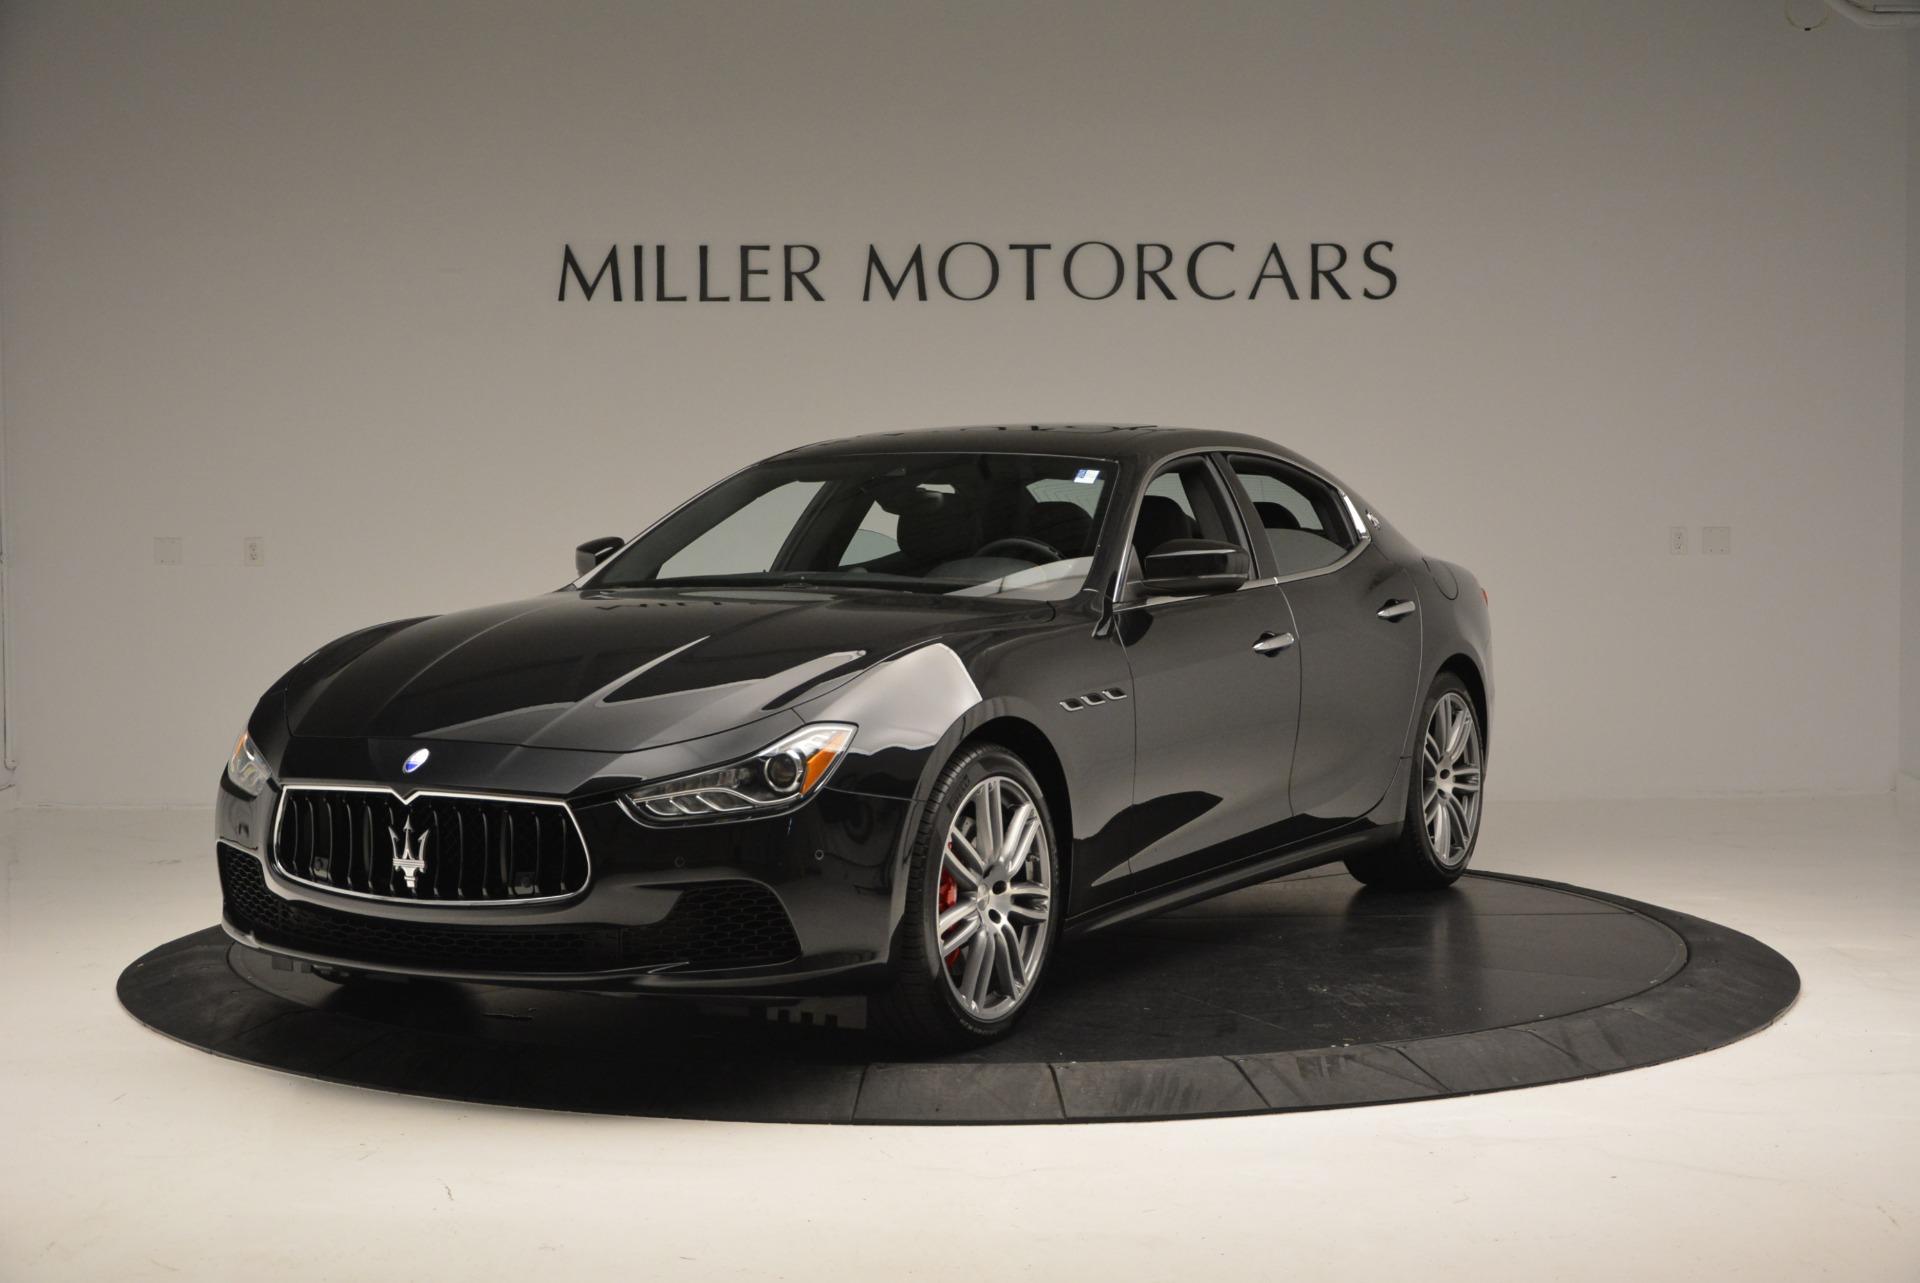 New 2018 Maserati Ghibli S Q4 For Sale In Greenwich, CT 1820_main